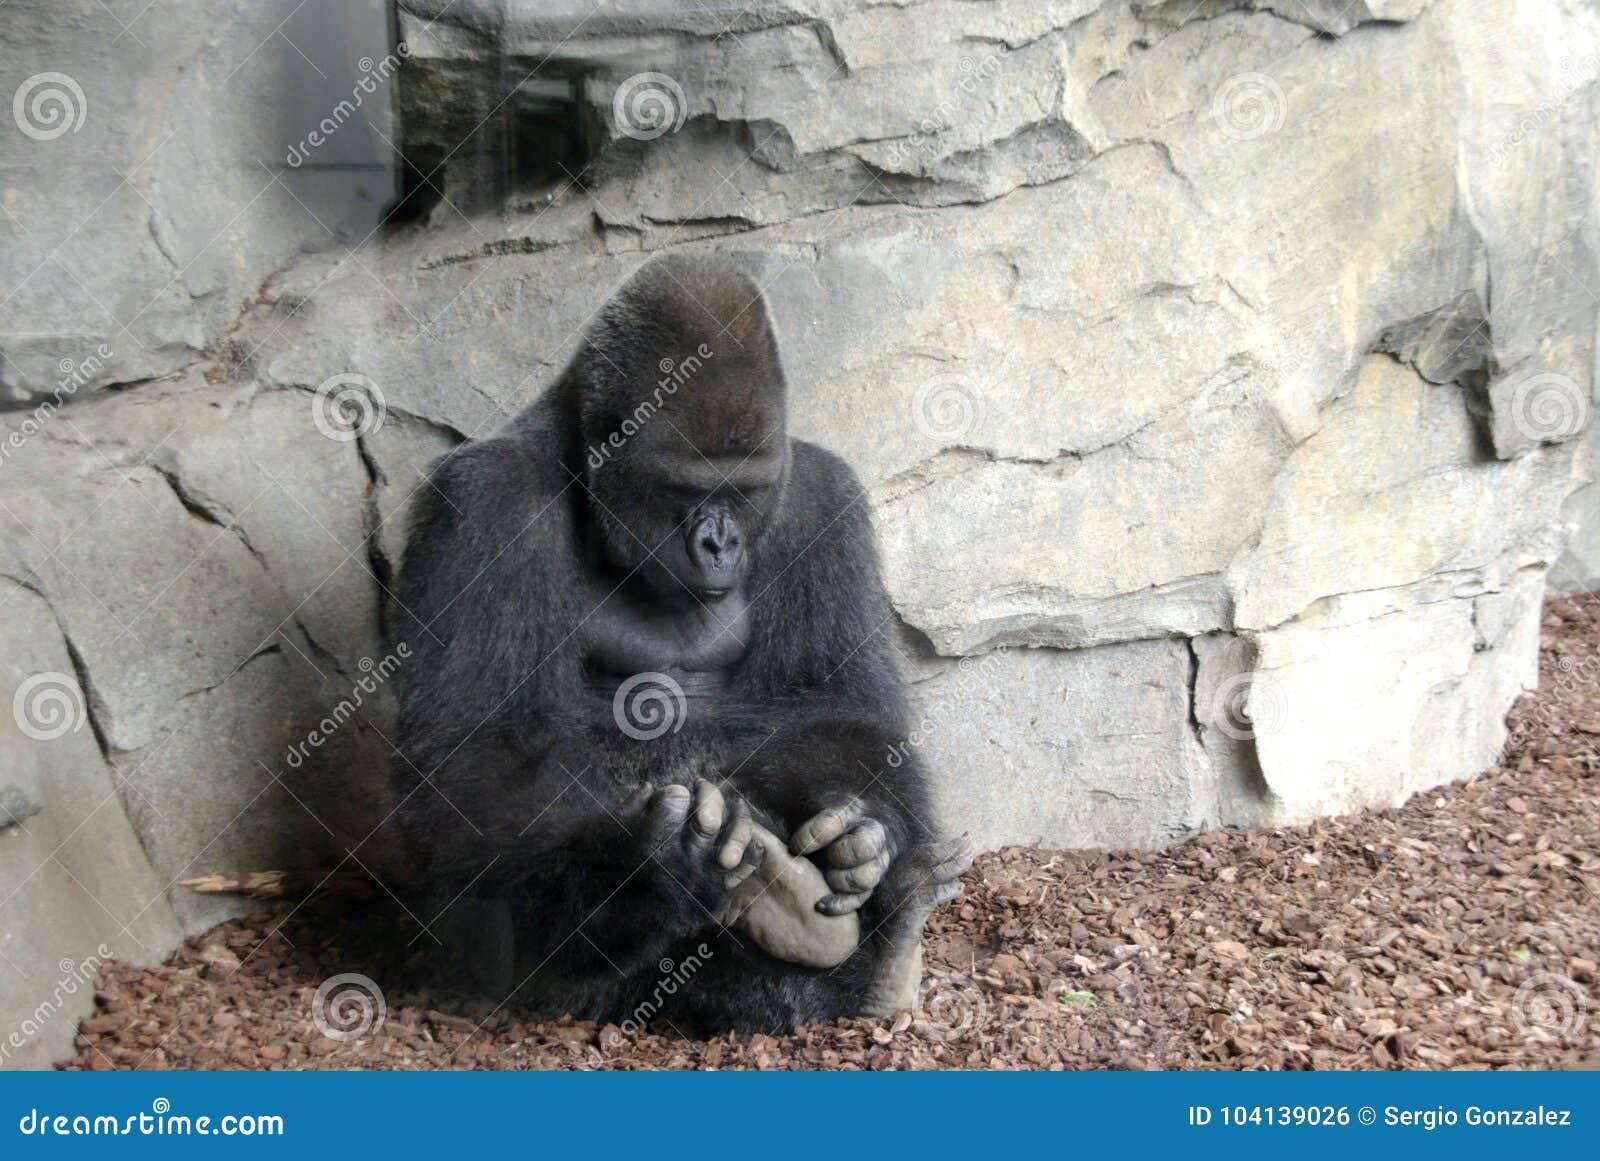 Macho de gorille